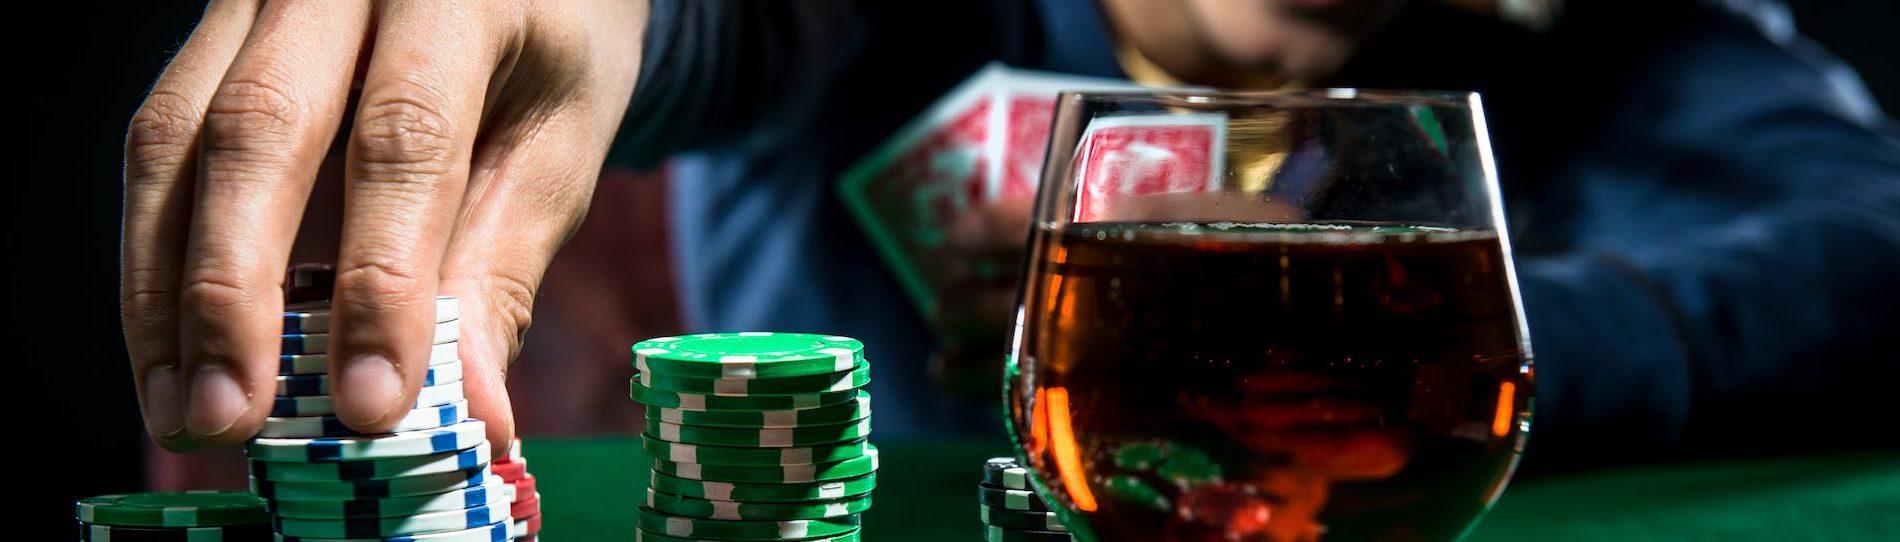 buck playing poker